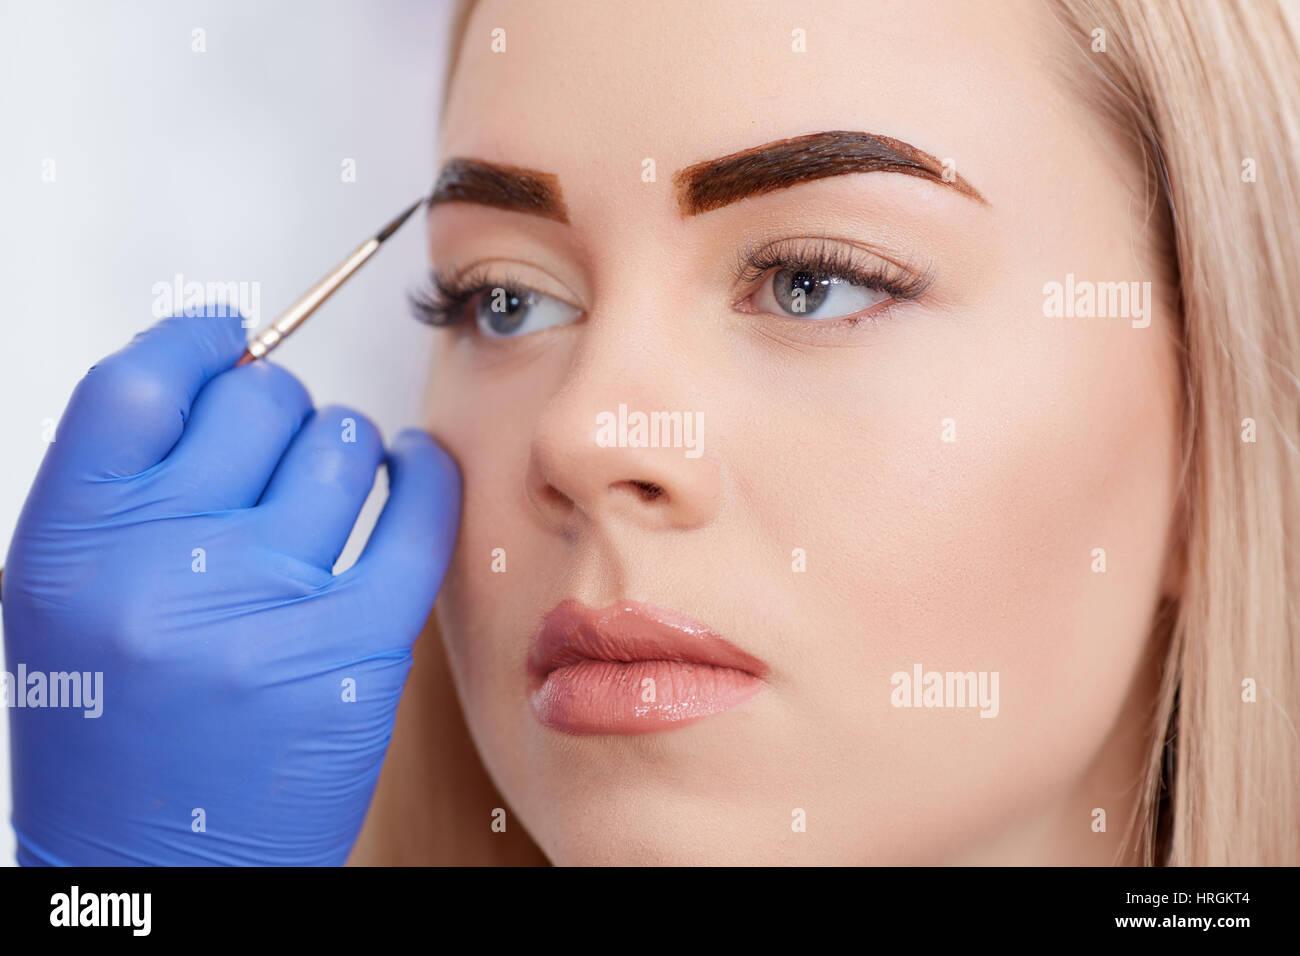 Cosmetologist En Bleu Gants Speciaux Application Maquillage